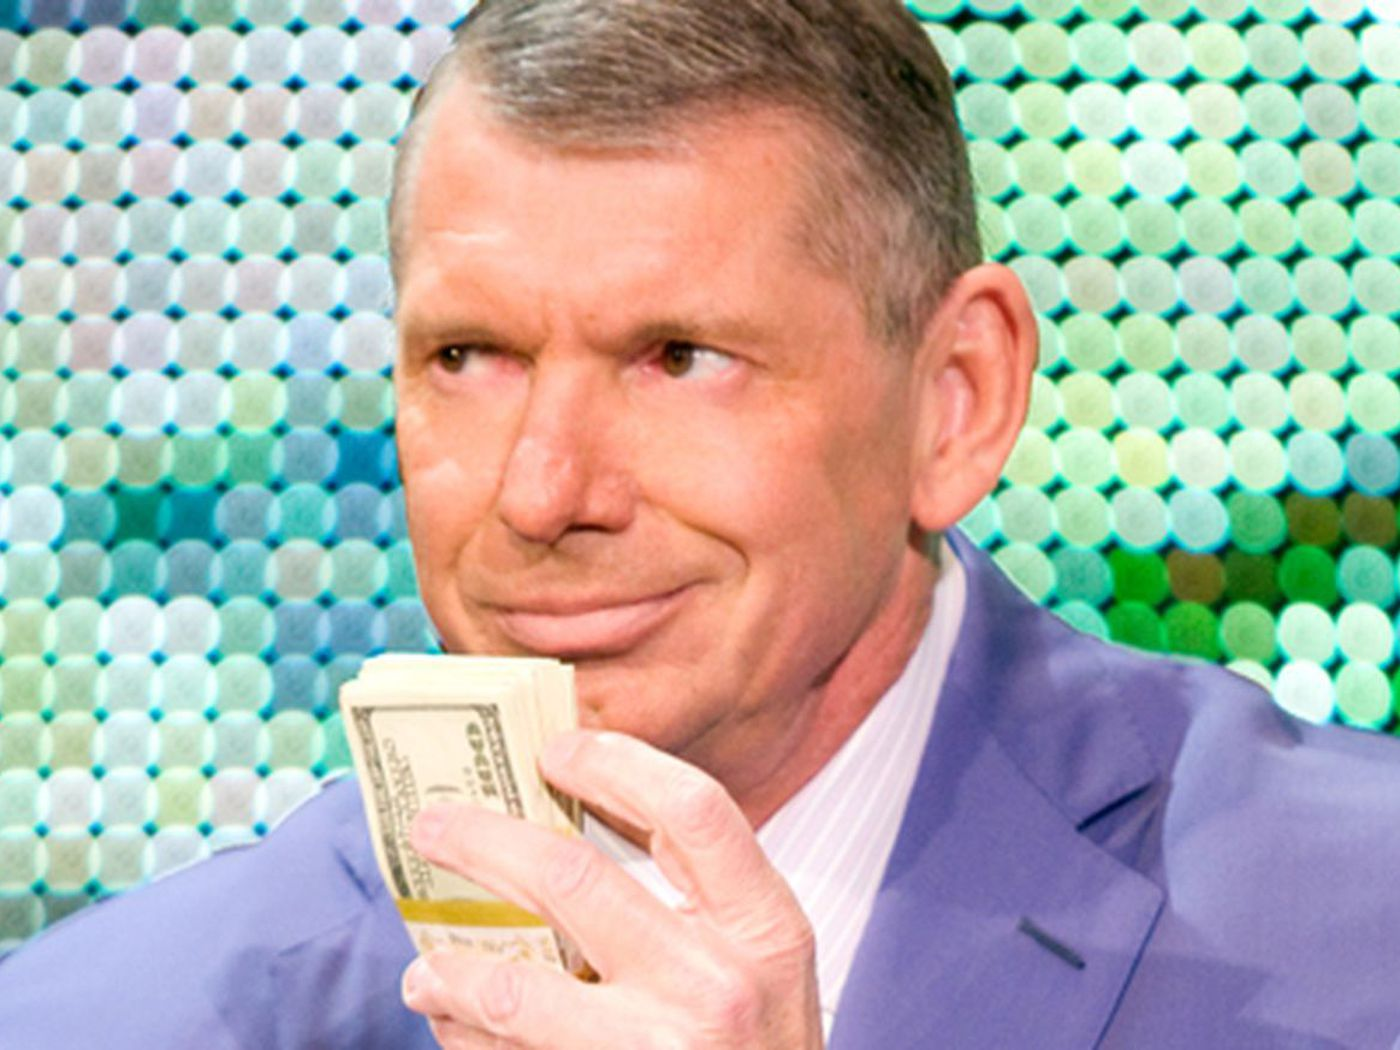 Vince-Mc-Mahon-money-0-0.0.jpg